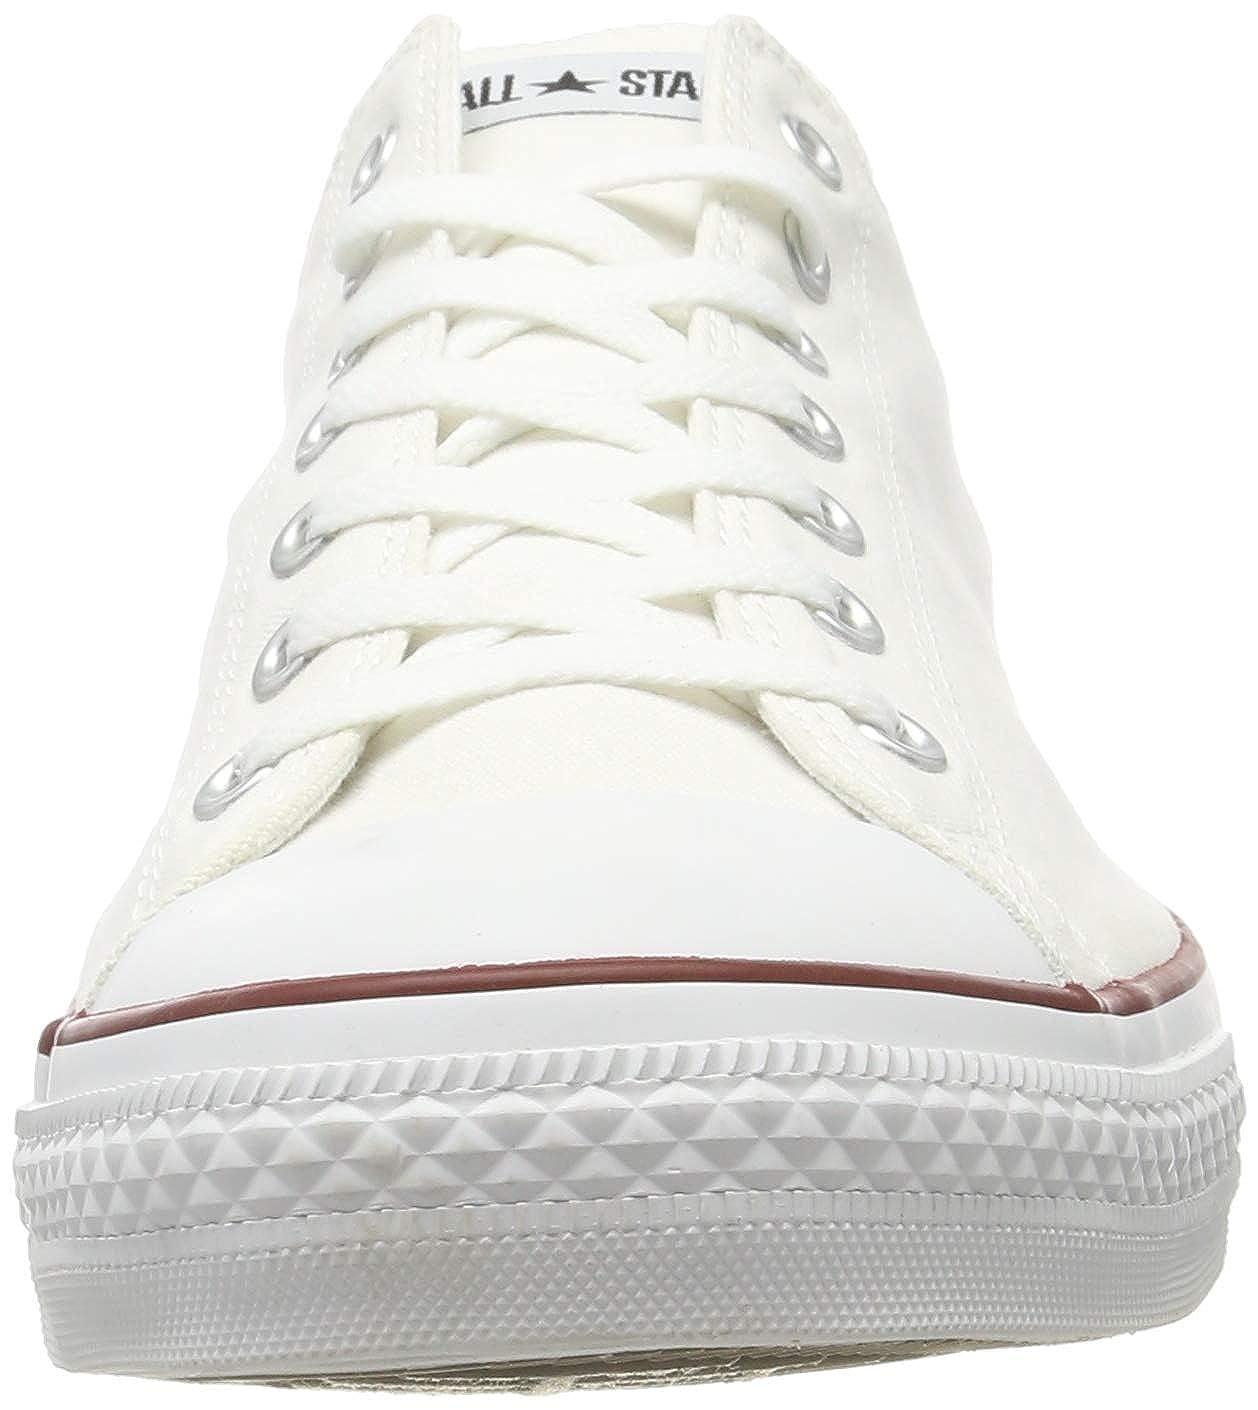 CONVERSE Designer Chucks Schuhe - ALL STAR - - -  ef81a2